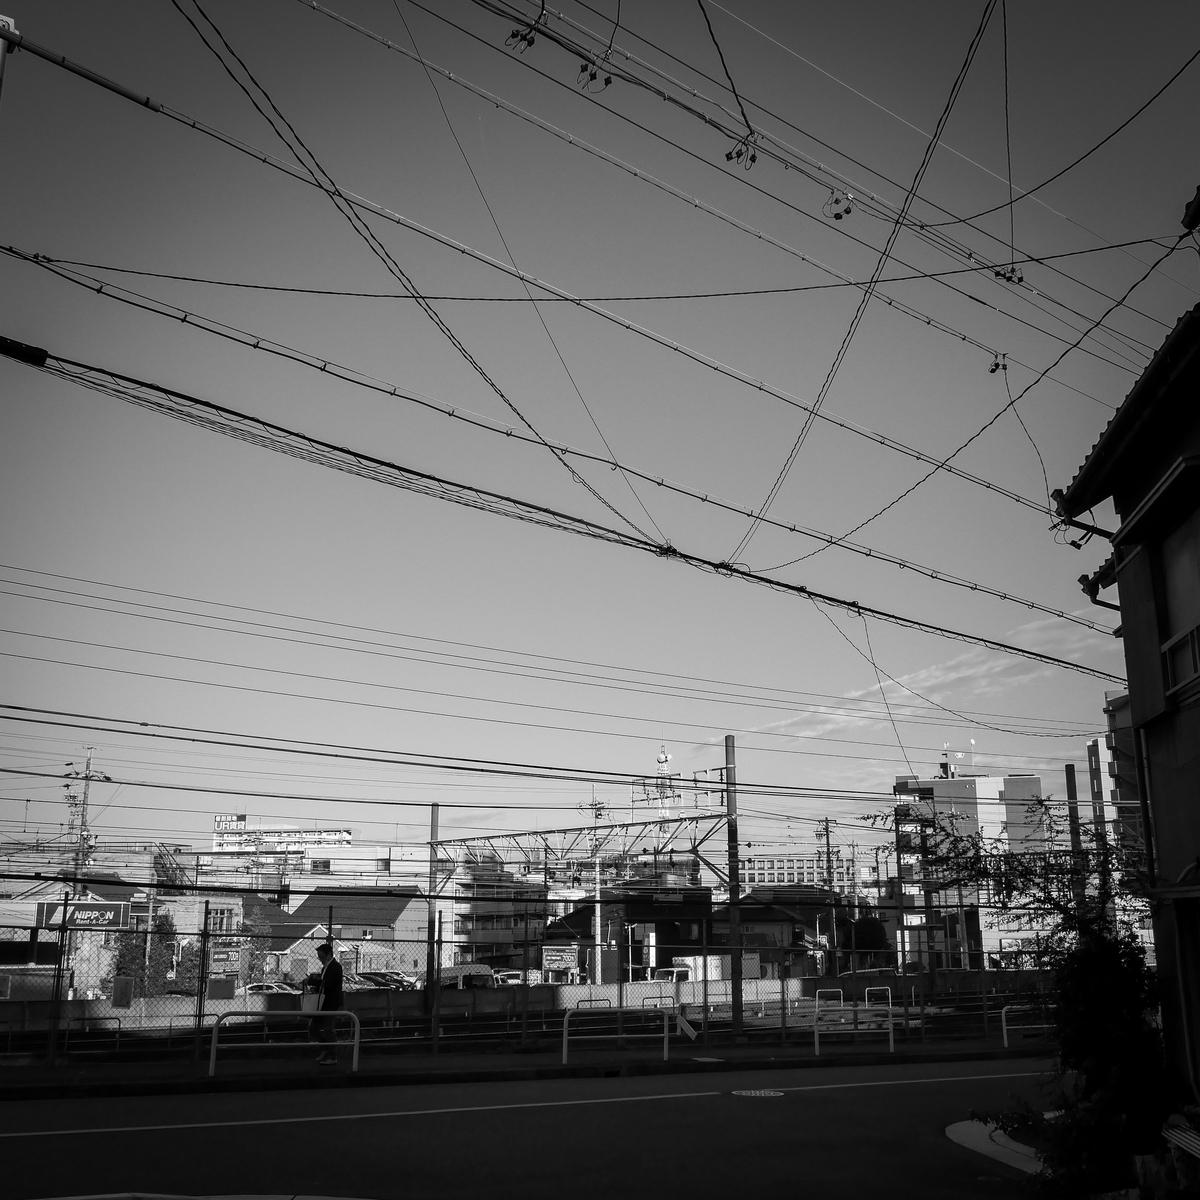 f:id:nagoya-meshi:20201126230320j:plain